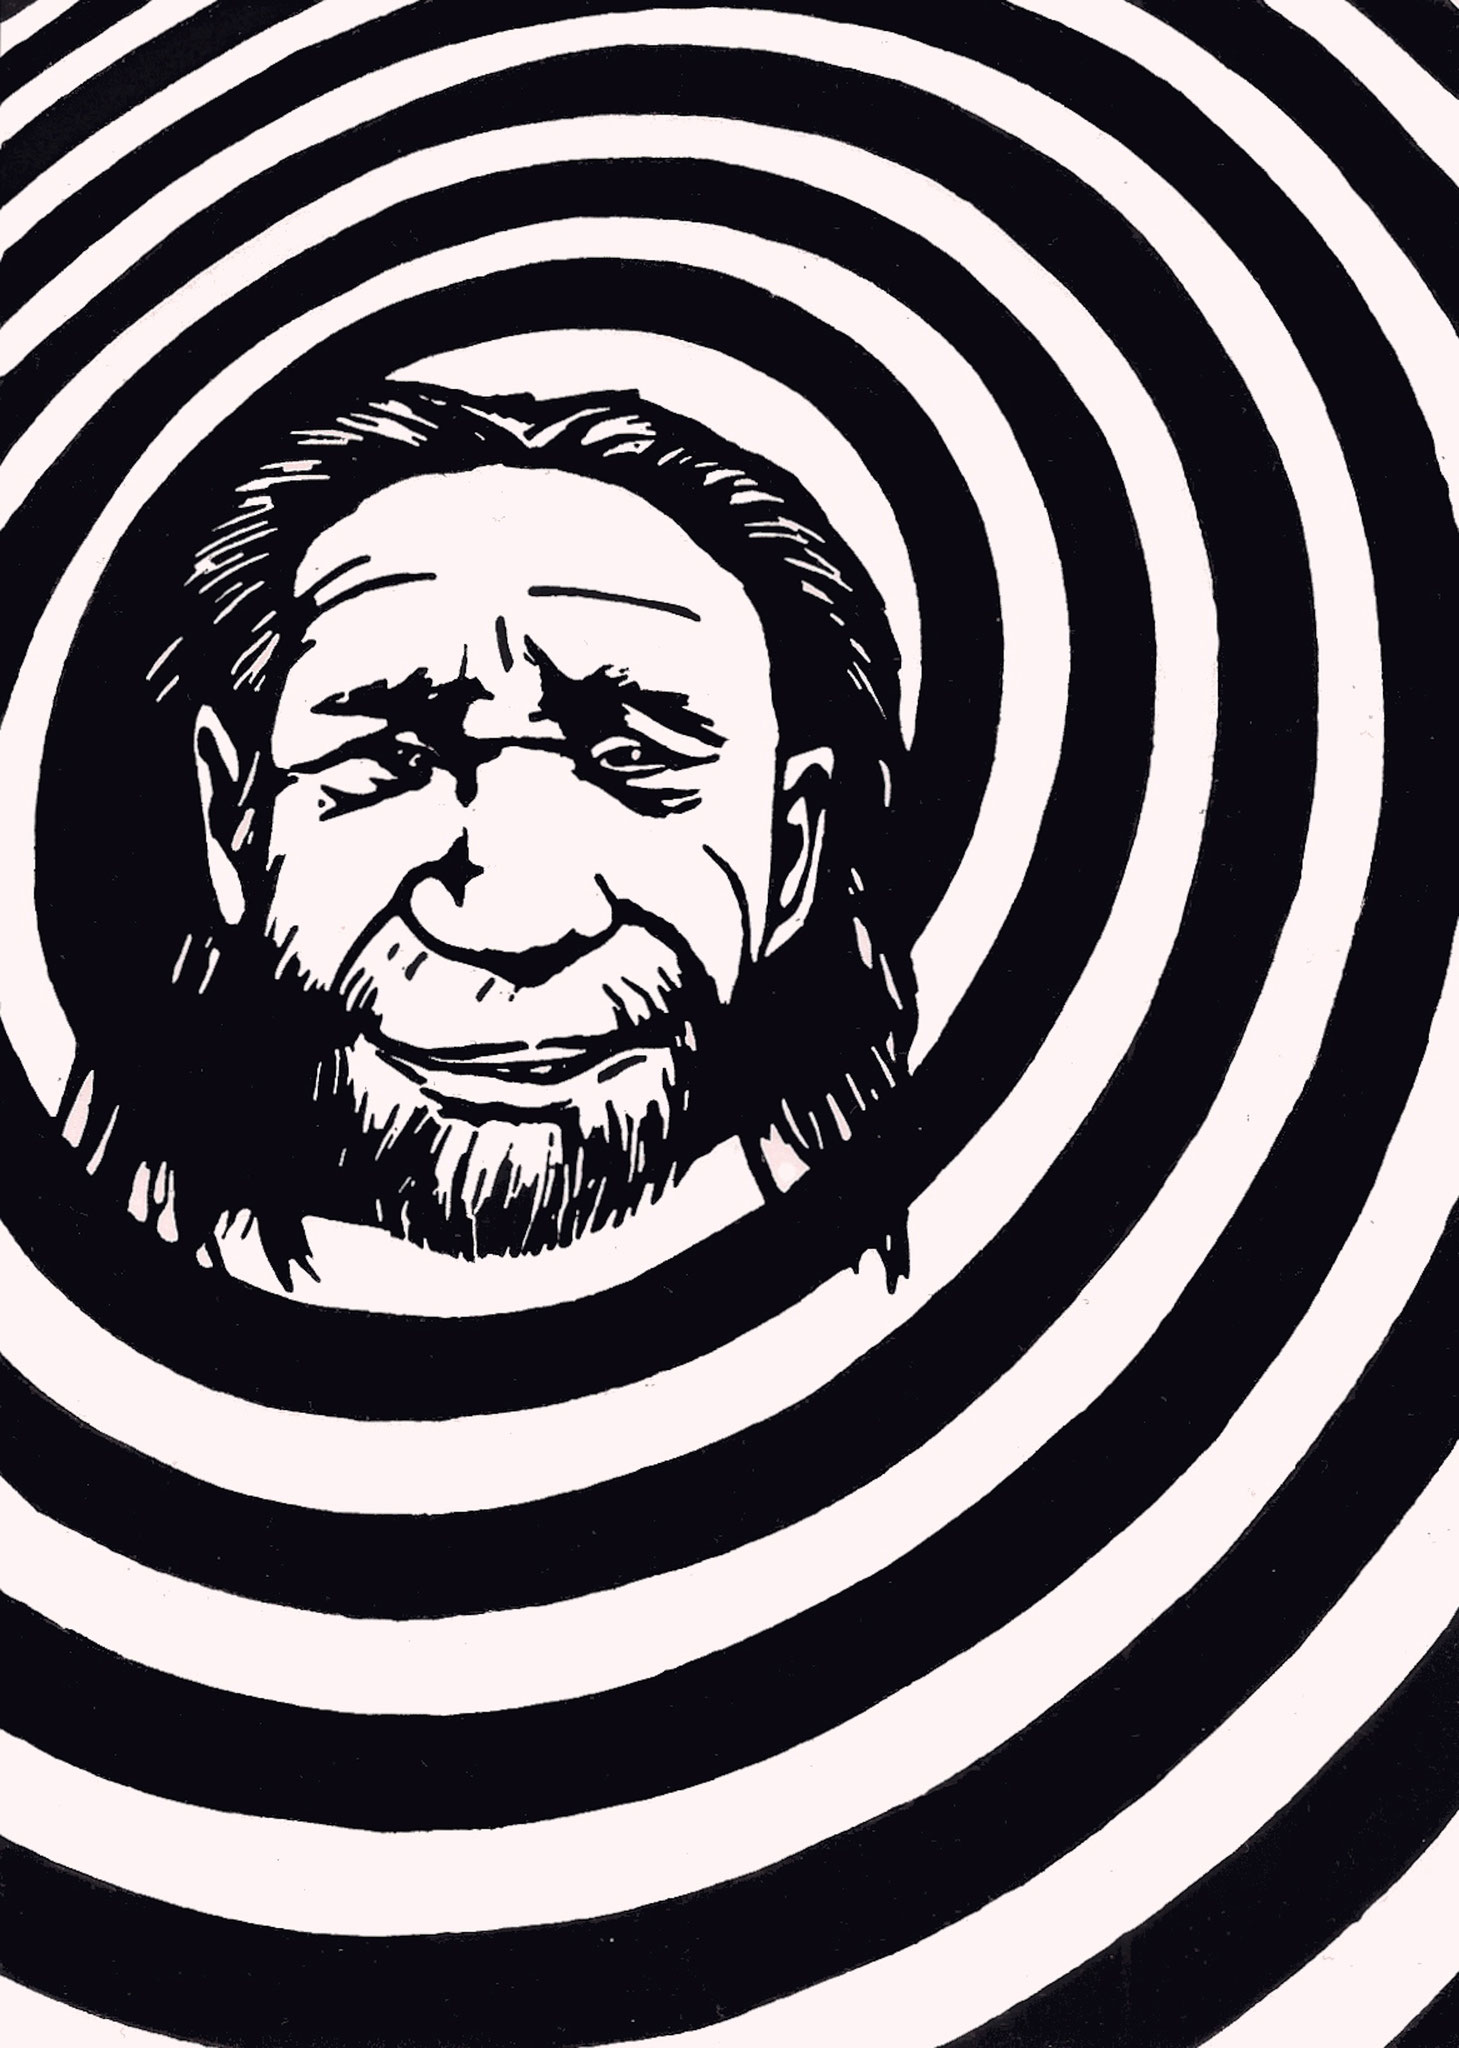 Neandertaler, 23/11/2017, Edition 5, A5